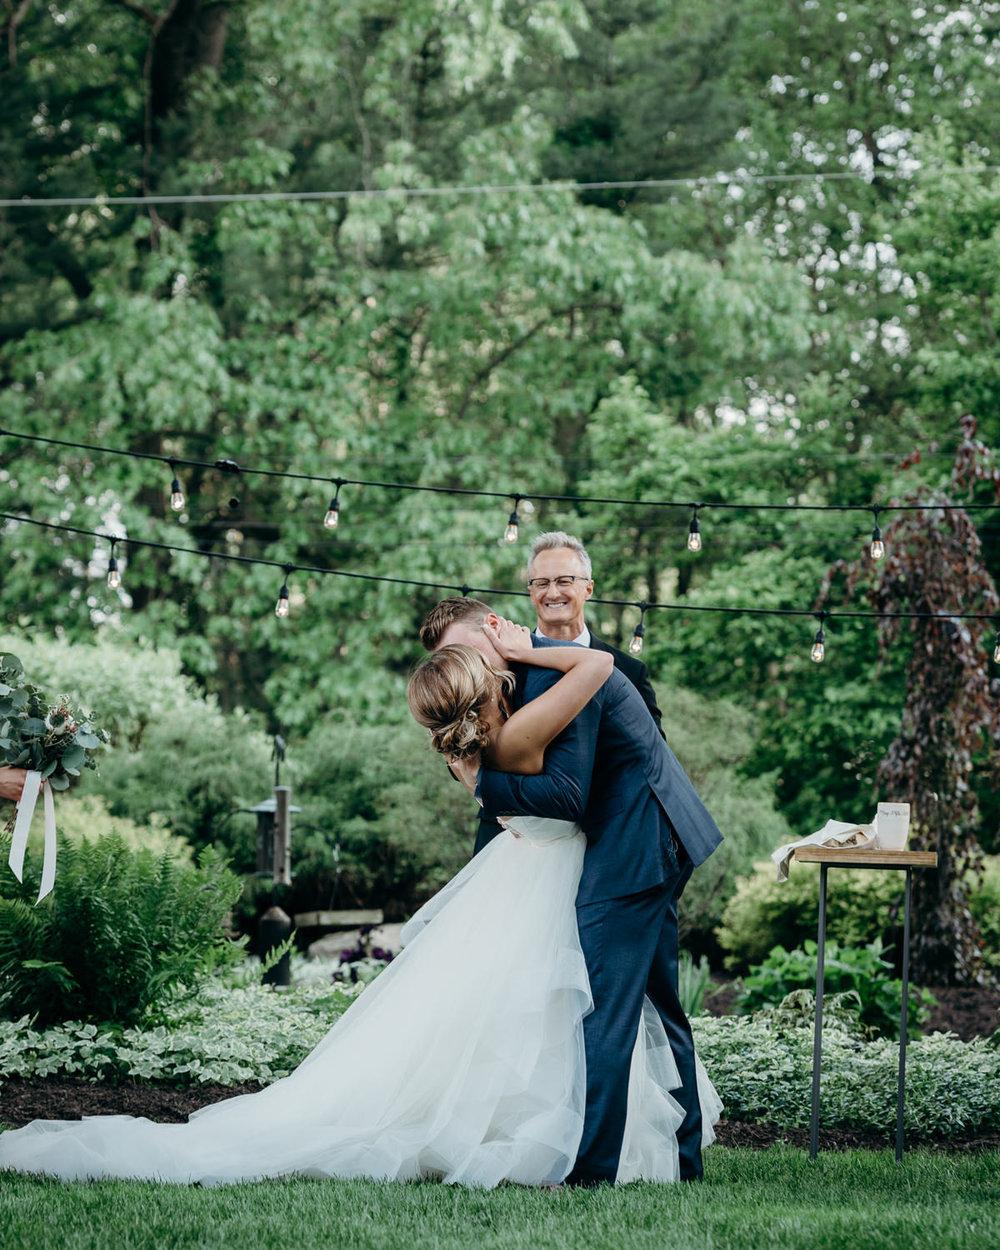 Grant Beachy wedding photographer Goshe, Elkhart, South Bend-043.jpg